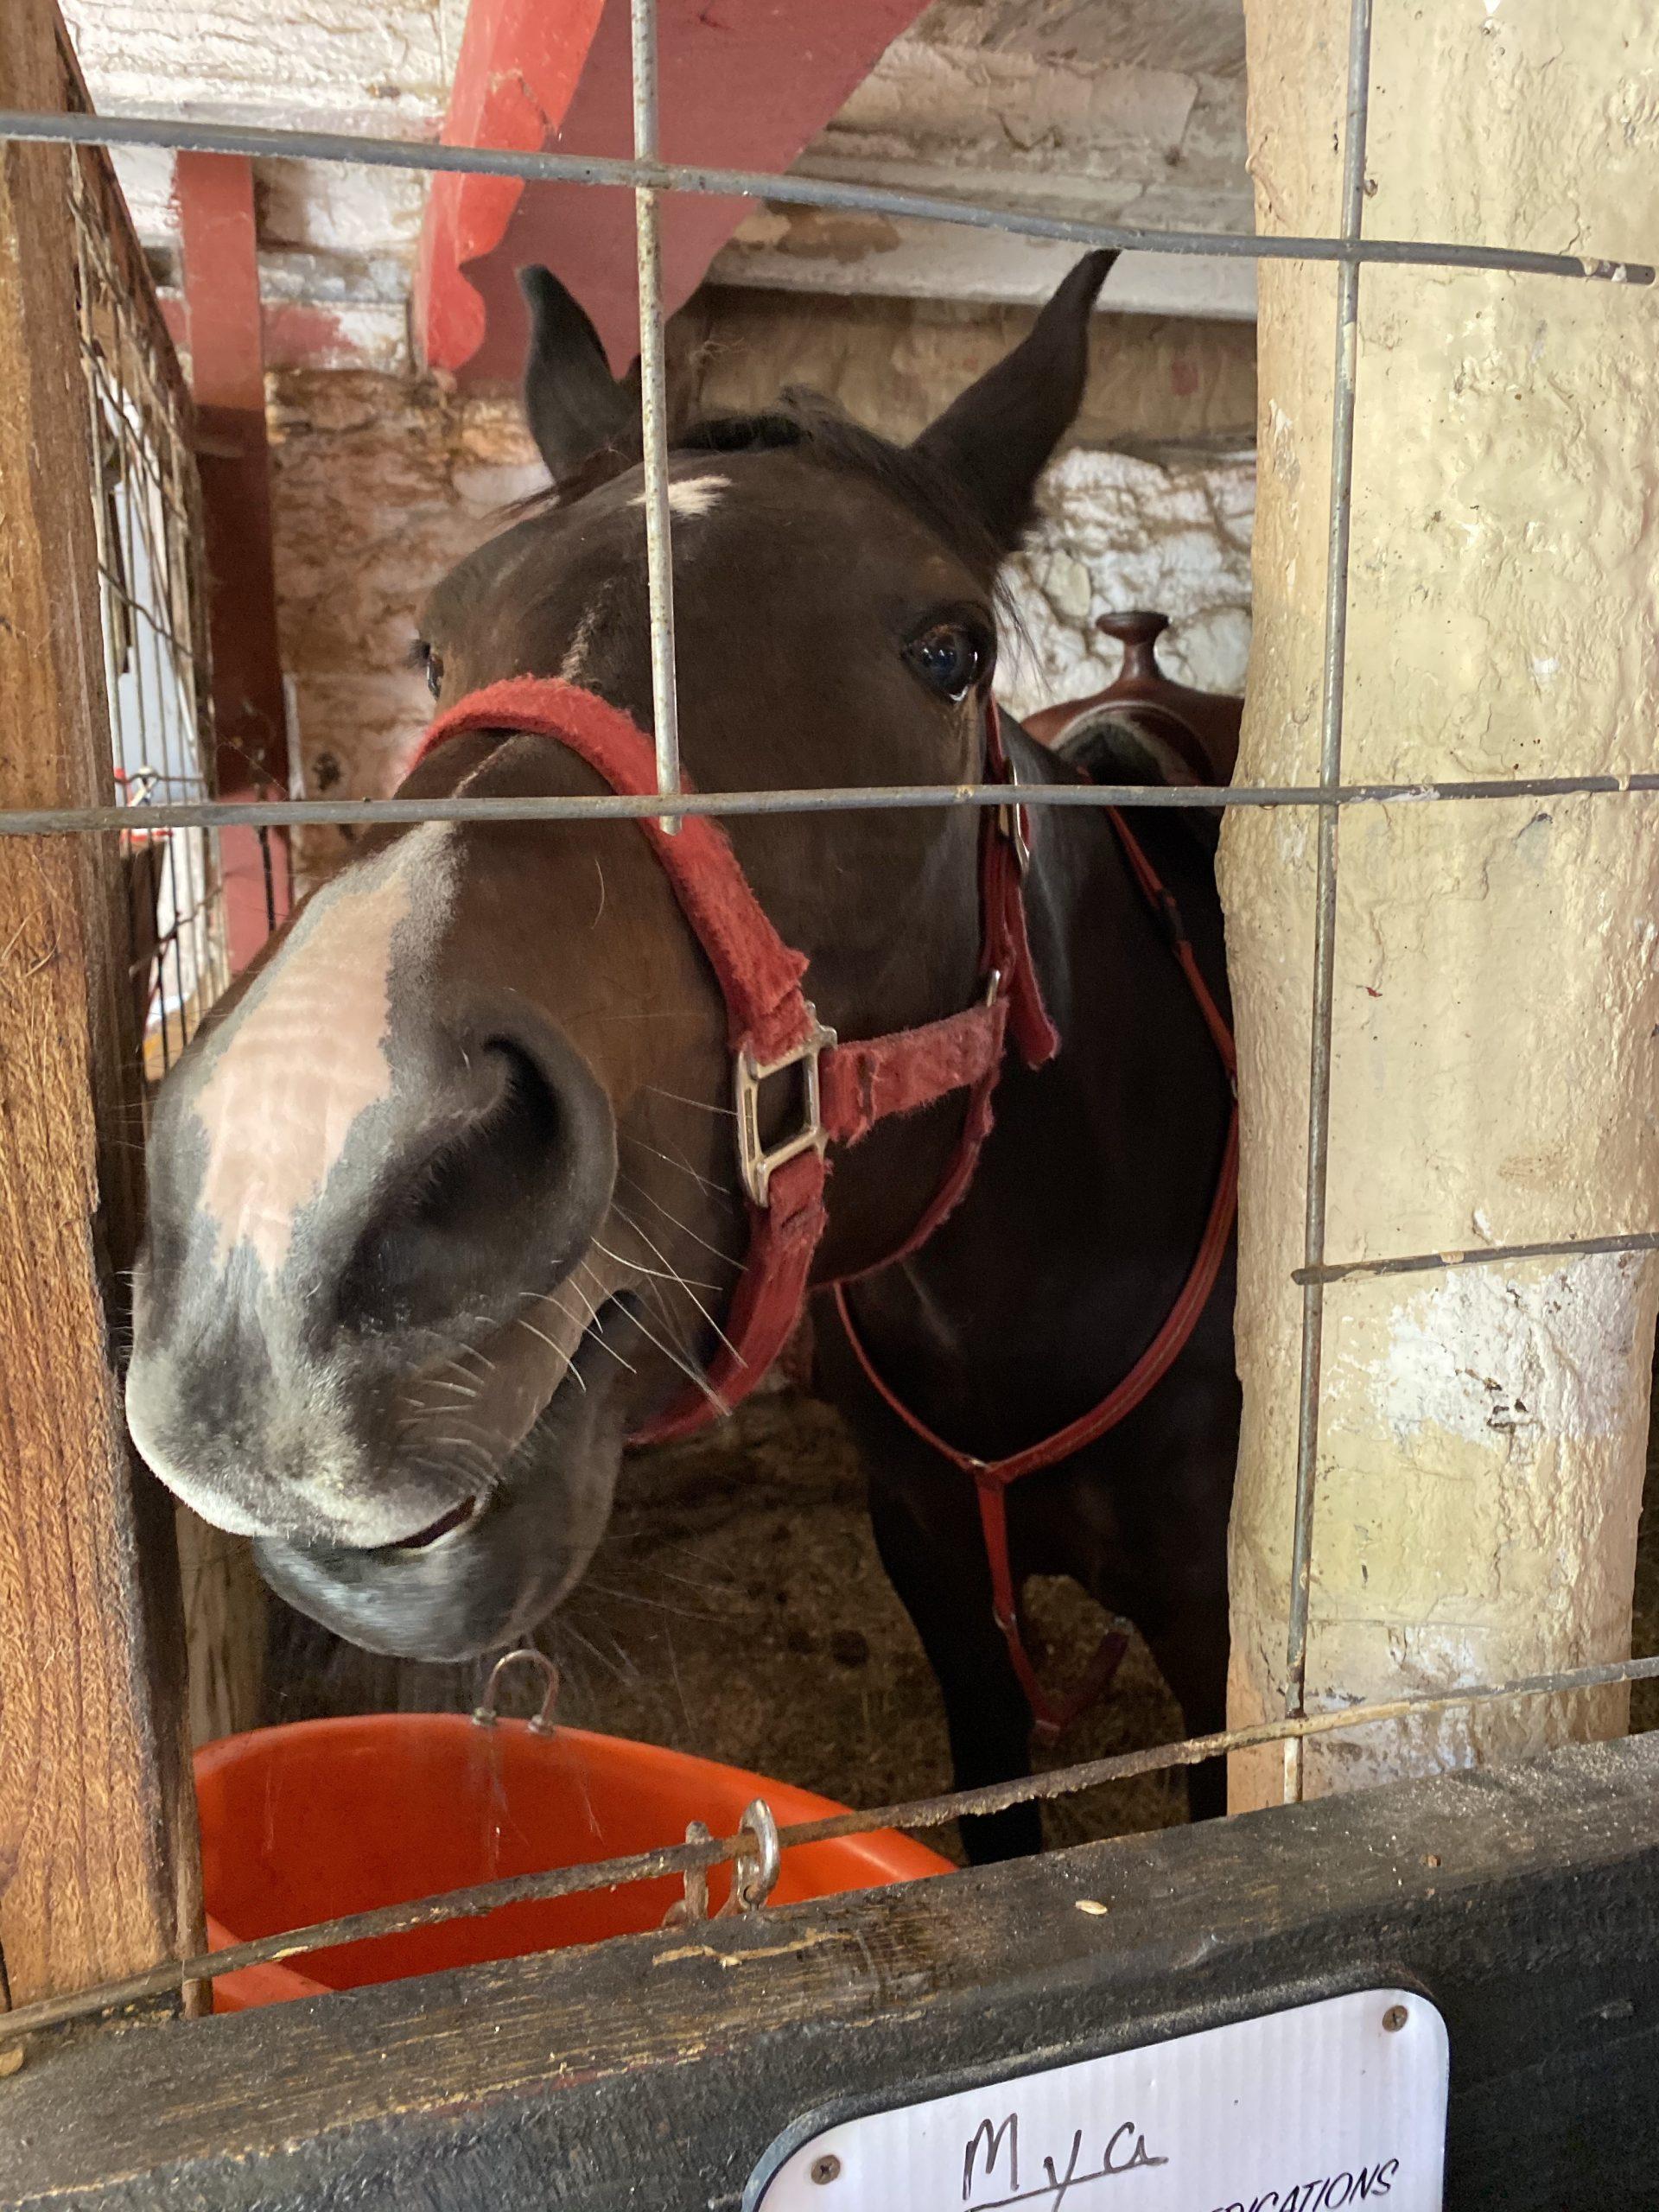 Patchwork Horseback Riding - Mya